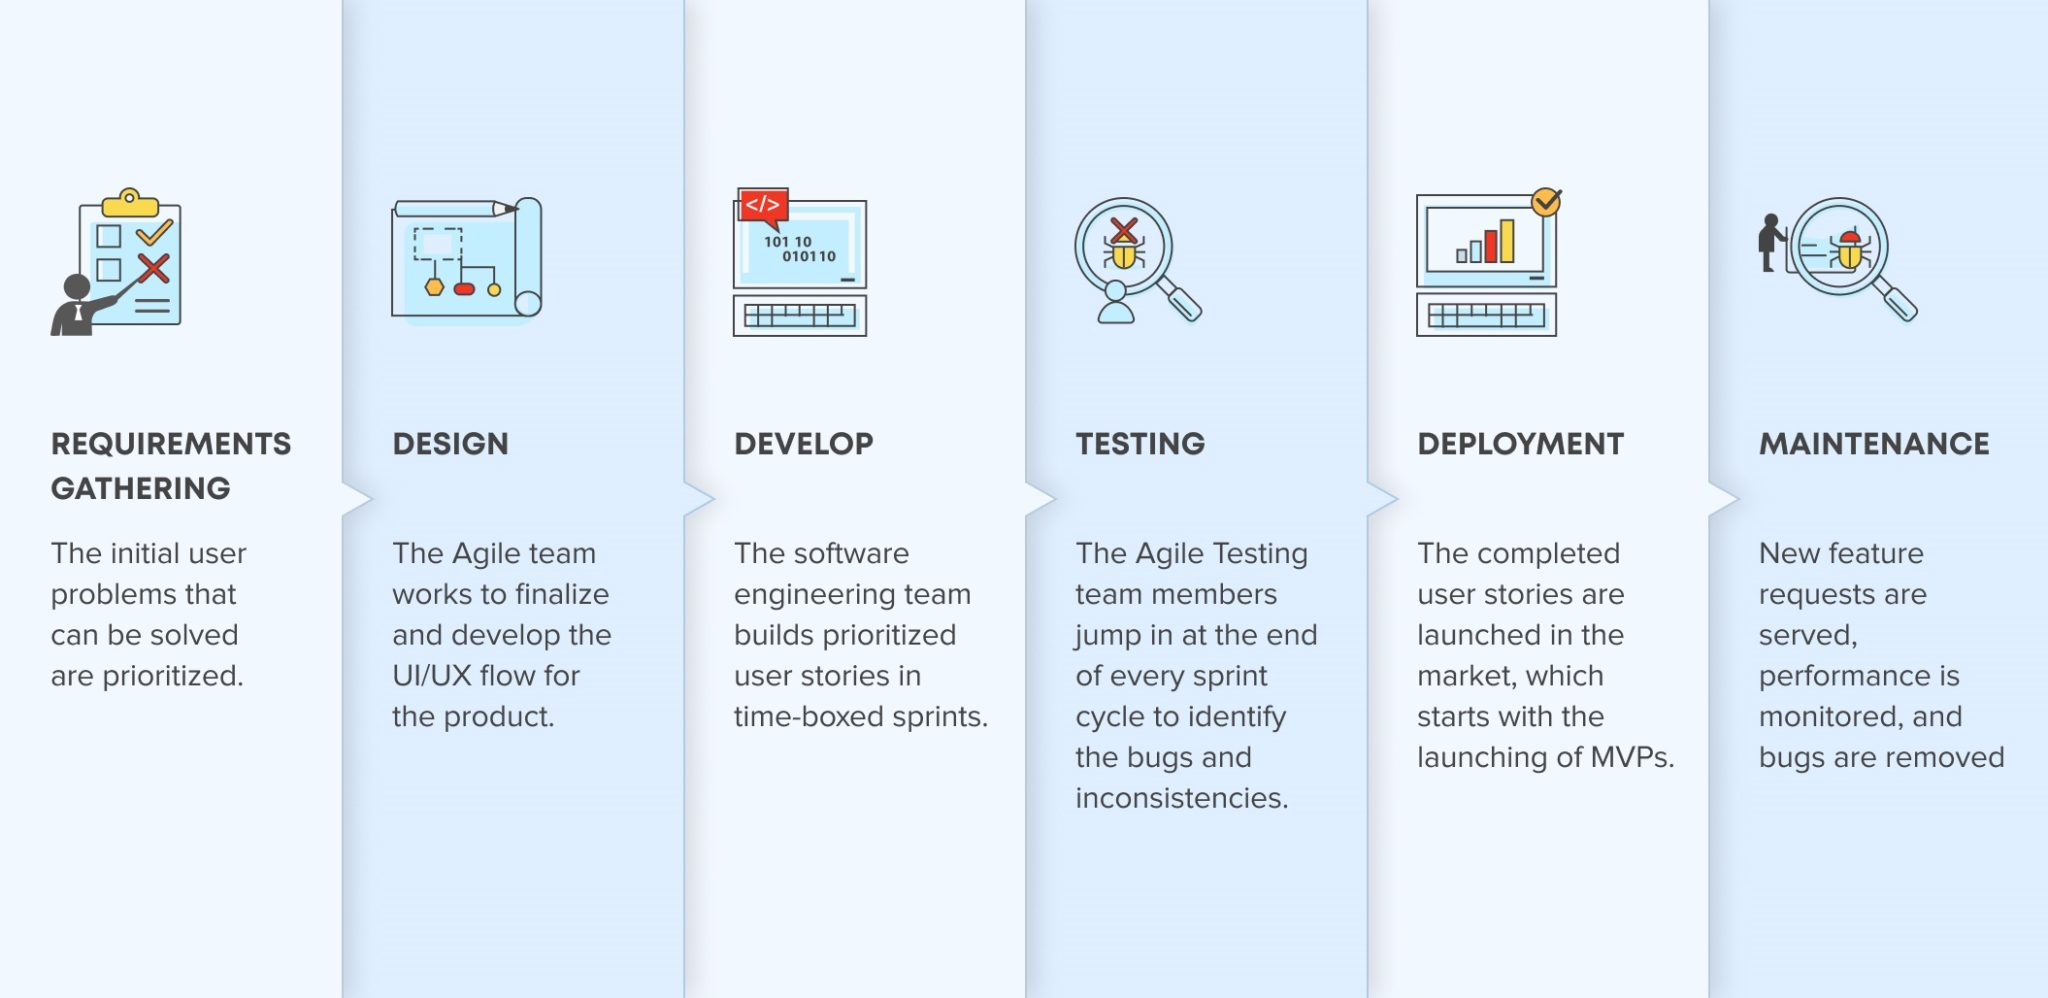 Agile development methodology lifecycle